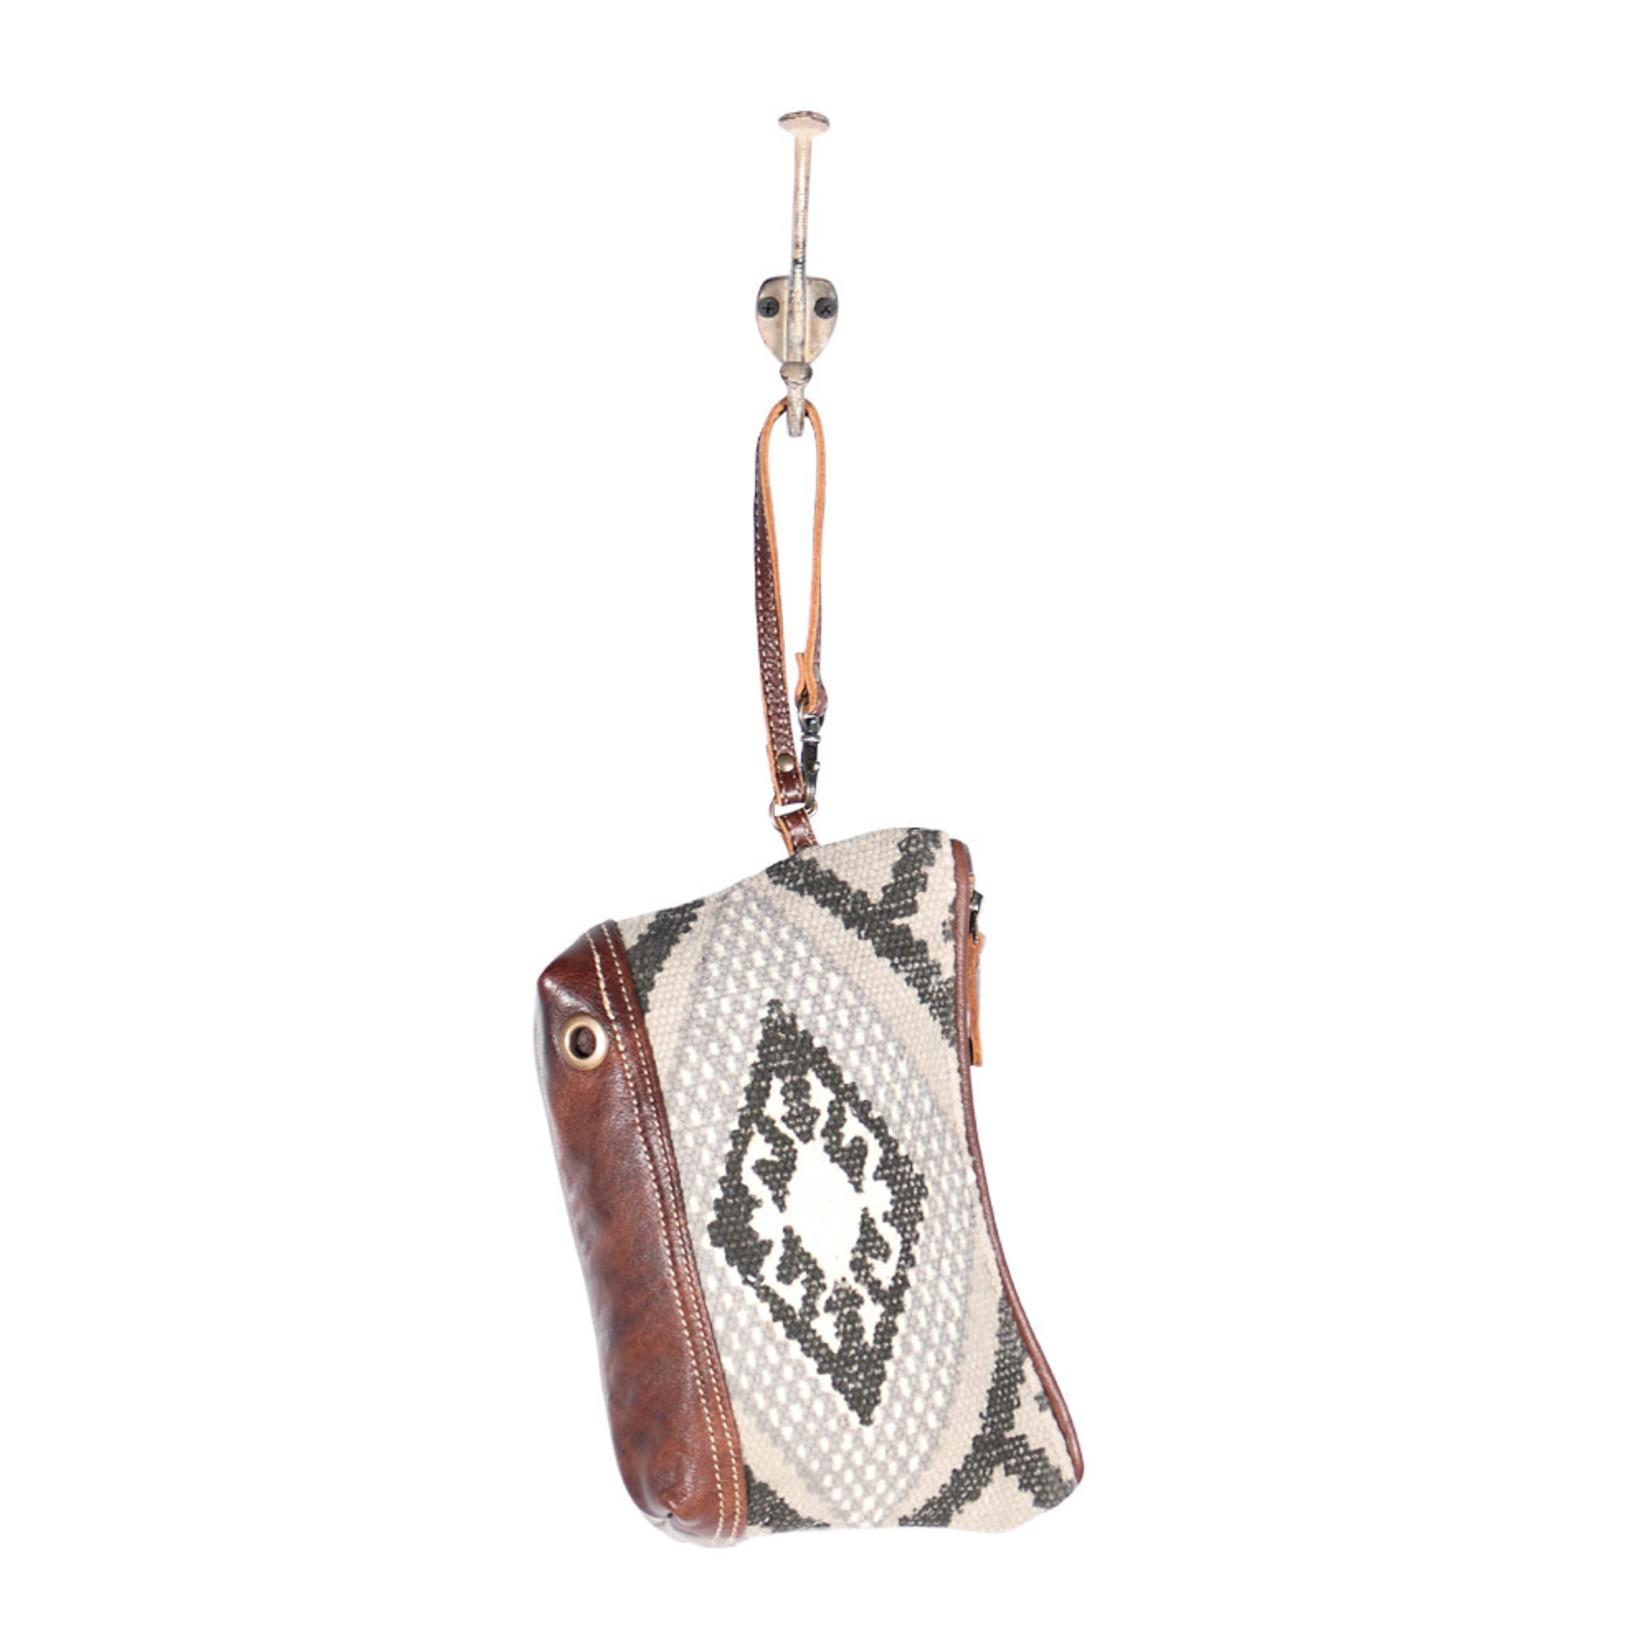 Myra Bags S-1911 Nature's Choice Pouch/Wristlet